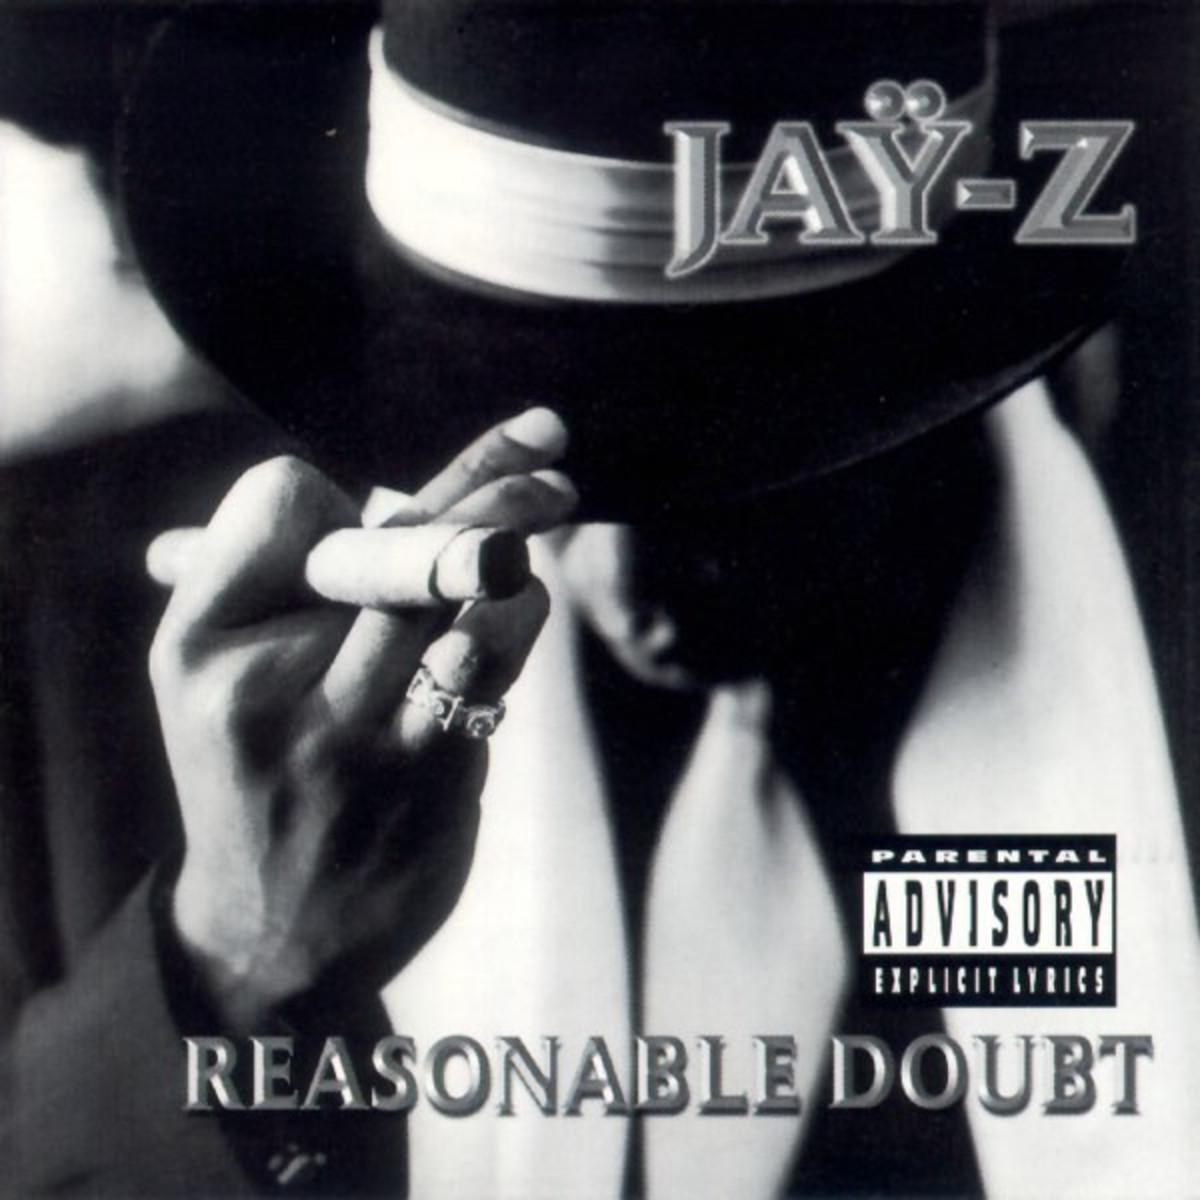 jay-z-reasonable-doubt